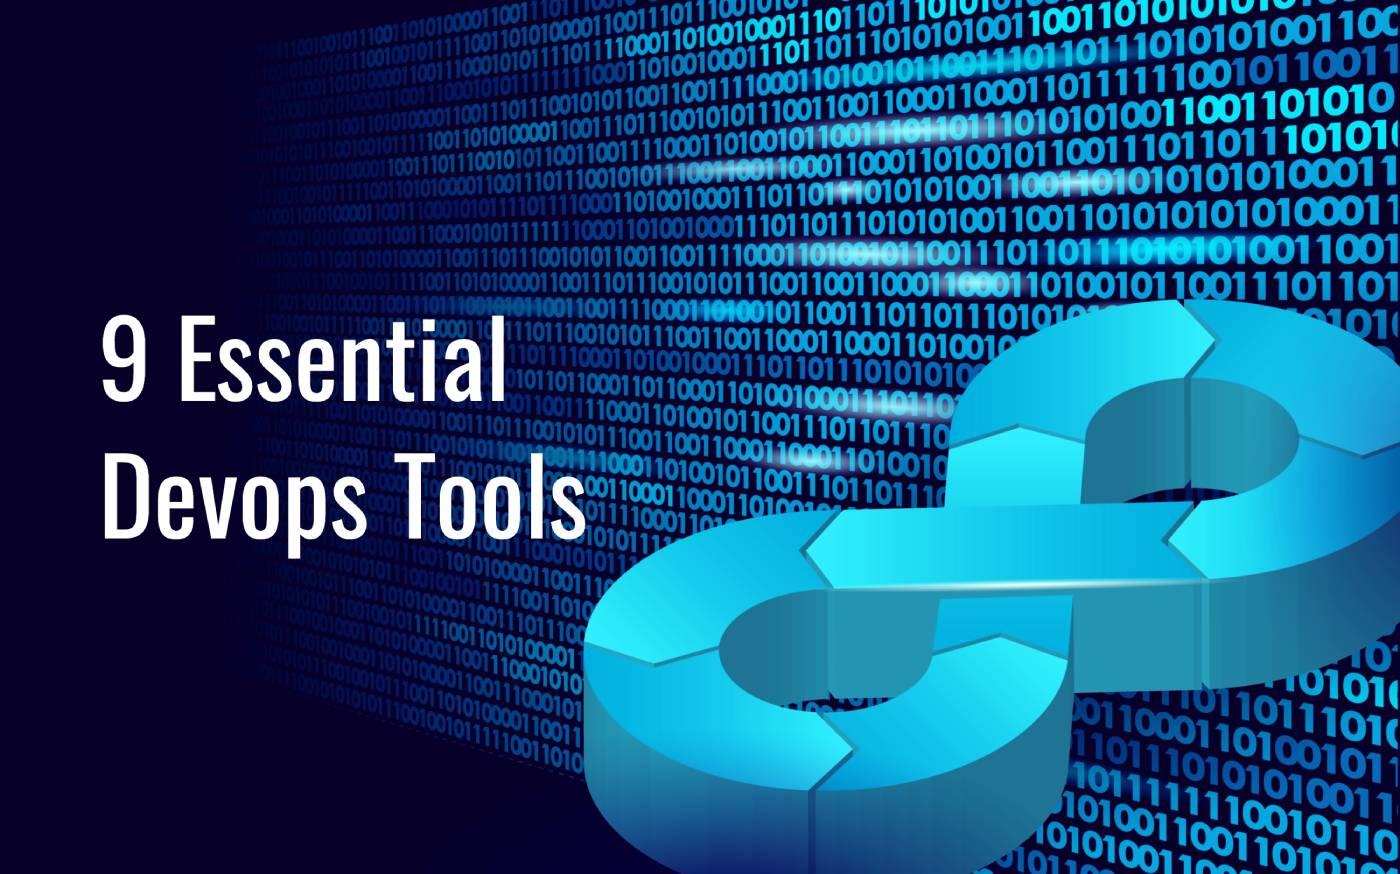 Essential DevOps Tools List